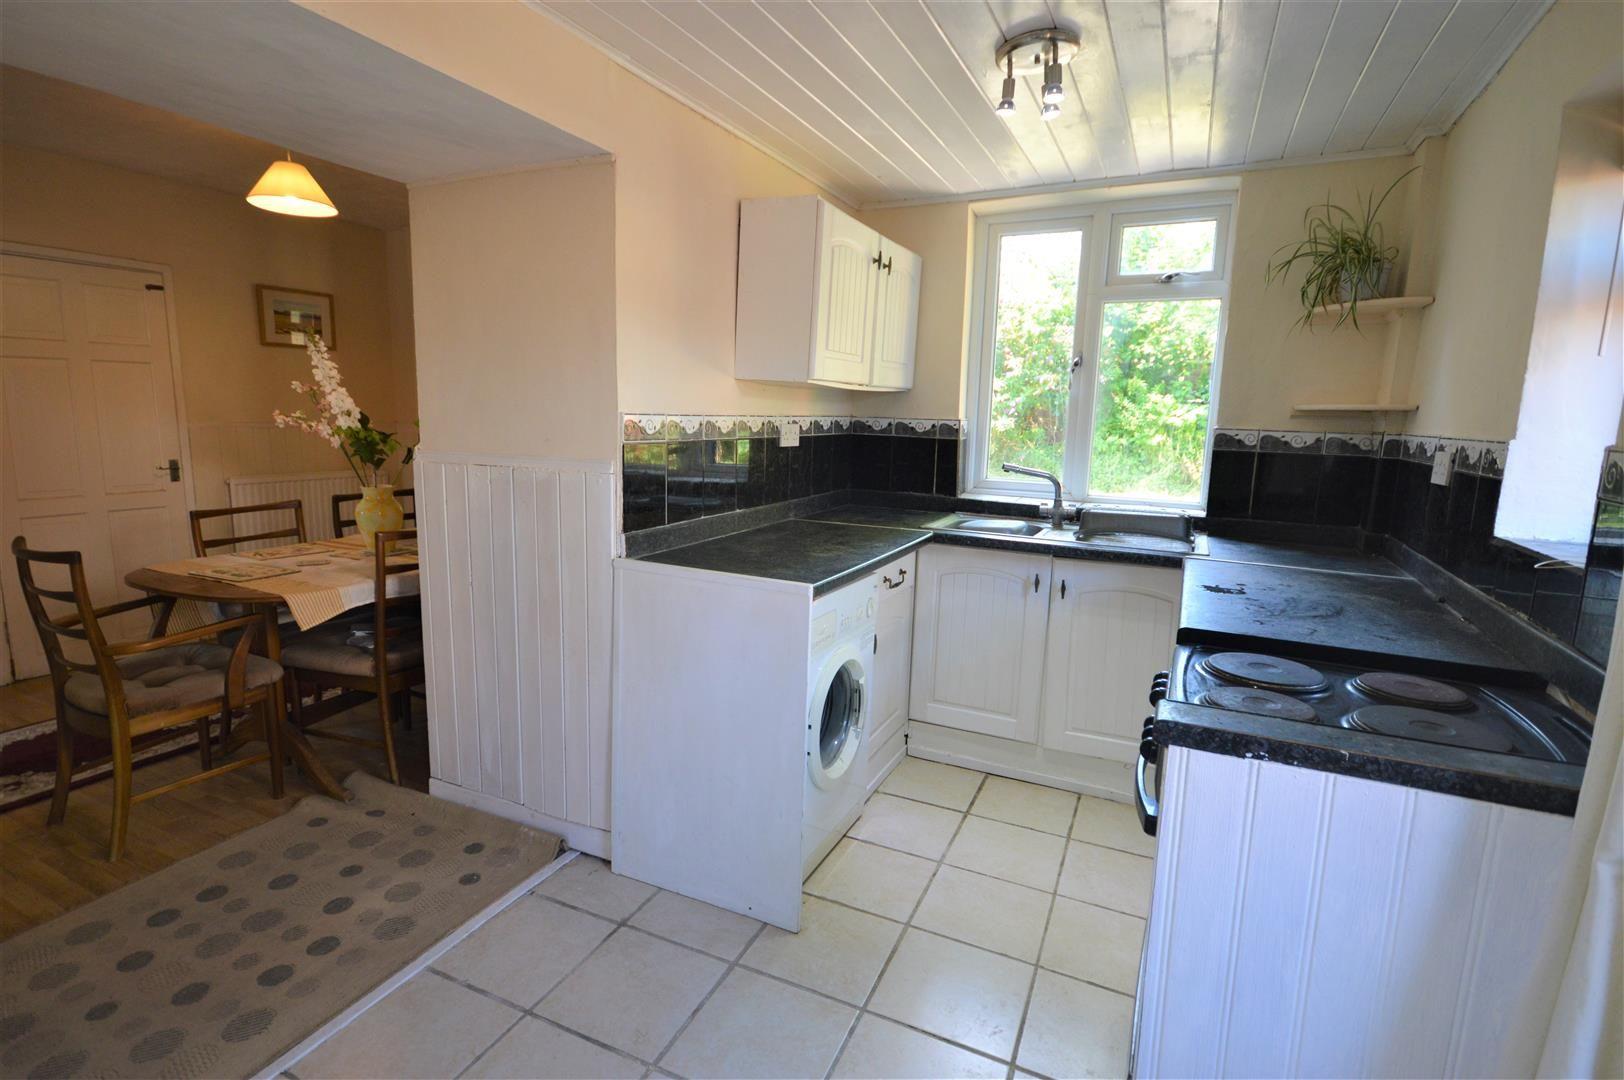 4 bed semi-detached for sale in Presteigne  - Property Image 6